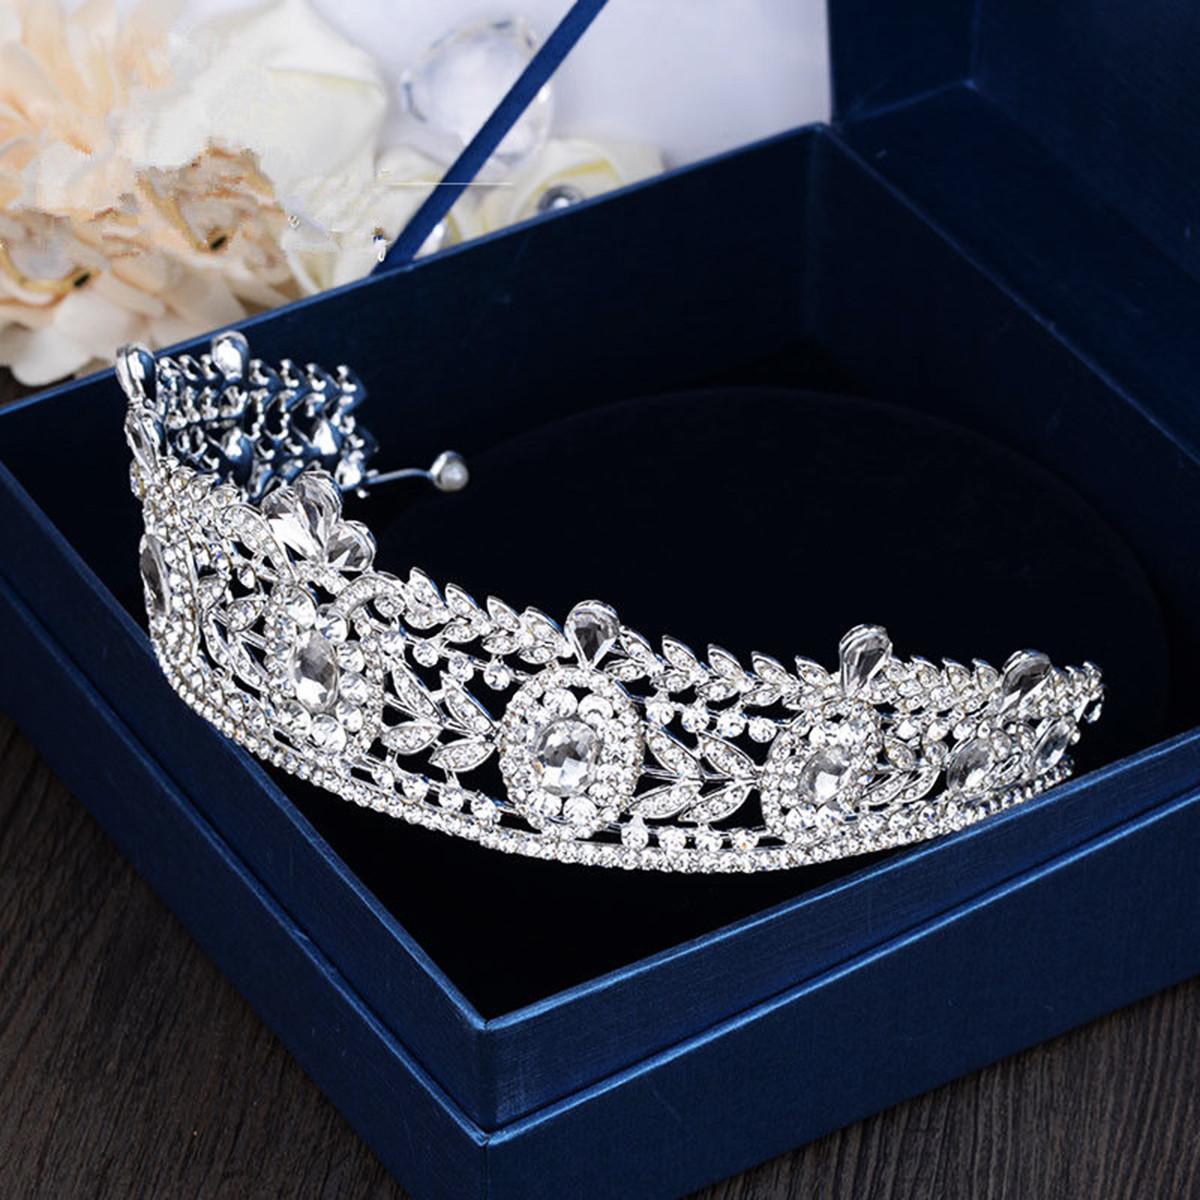 Bride Rhinestone Crystal Princess Queen Crown Tiara Head Jewelry Wedding Party Prom Headpiece